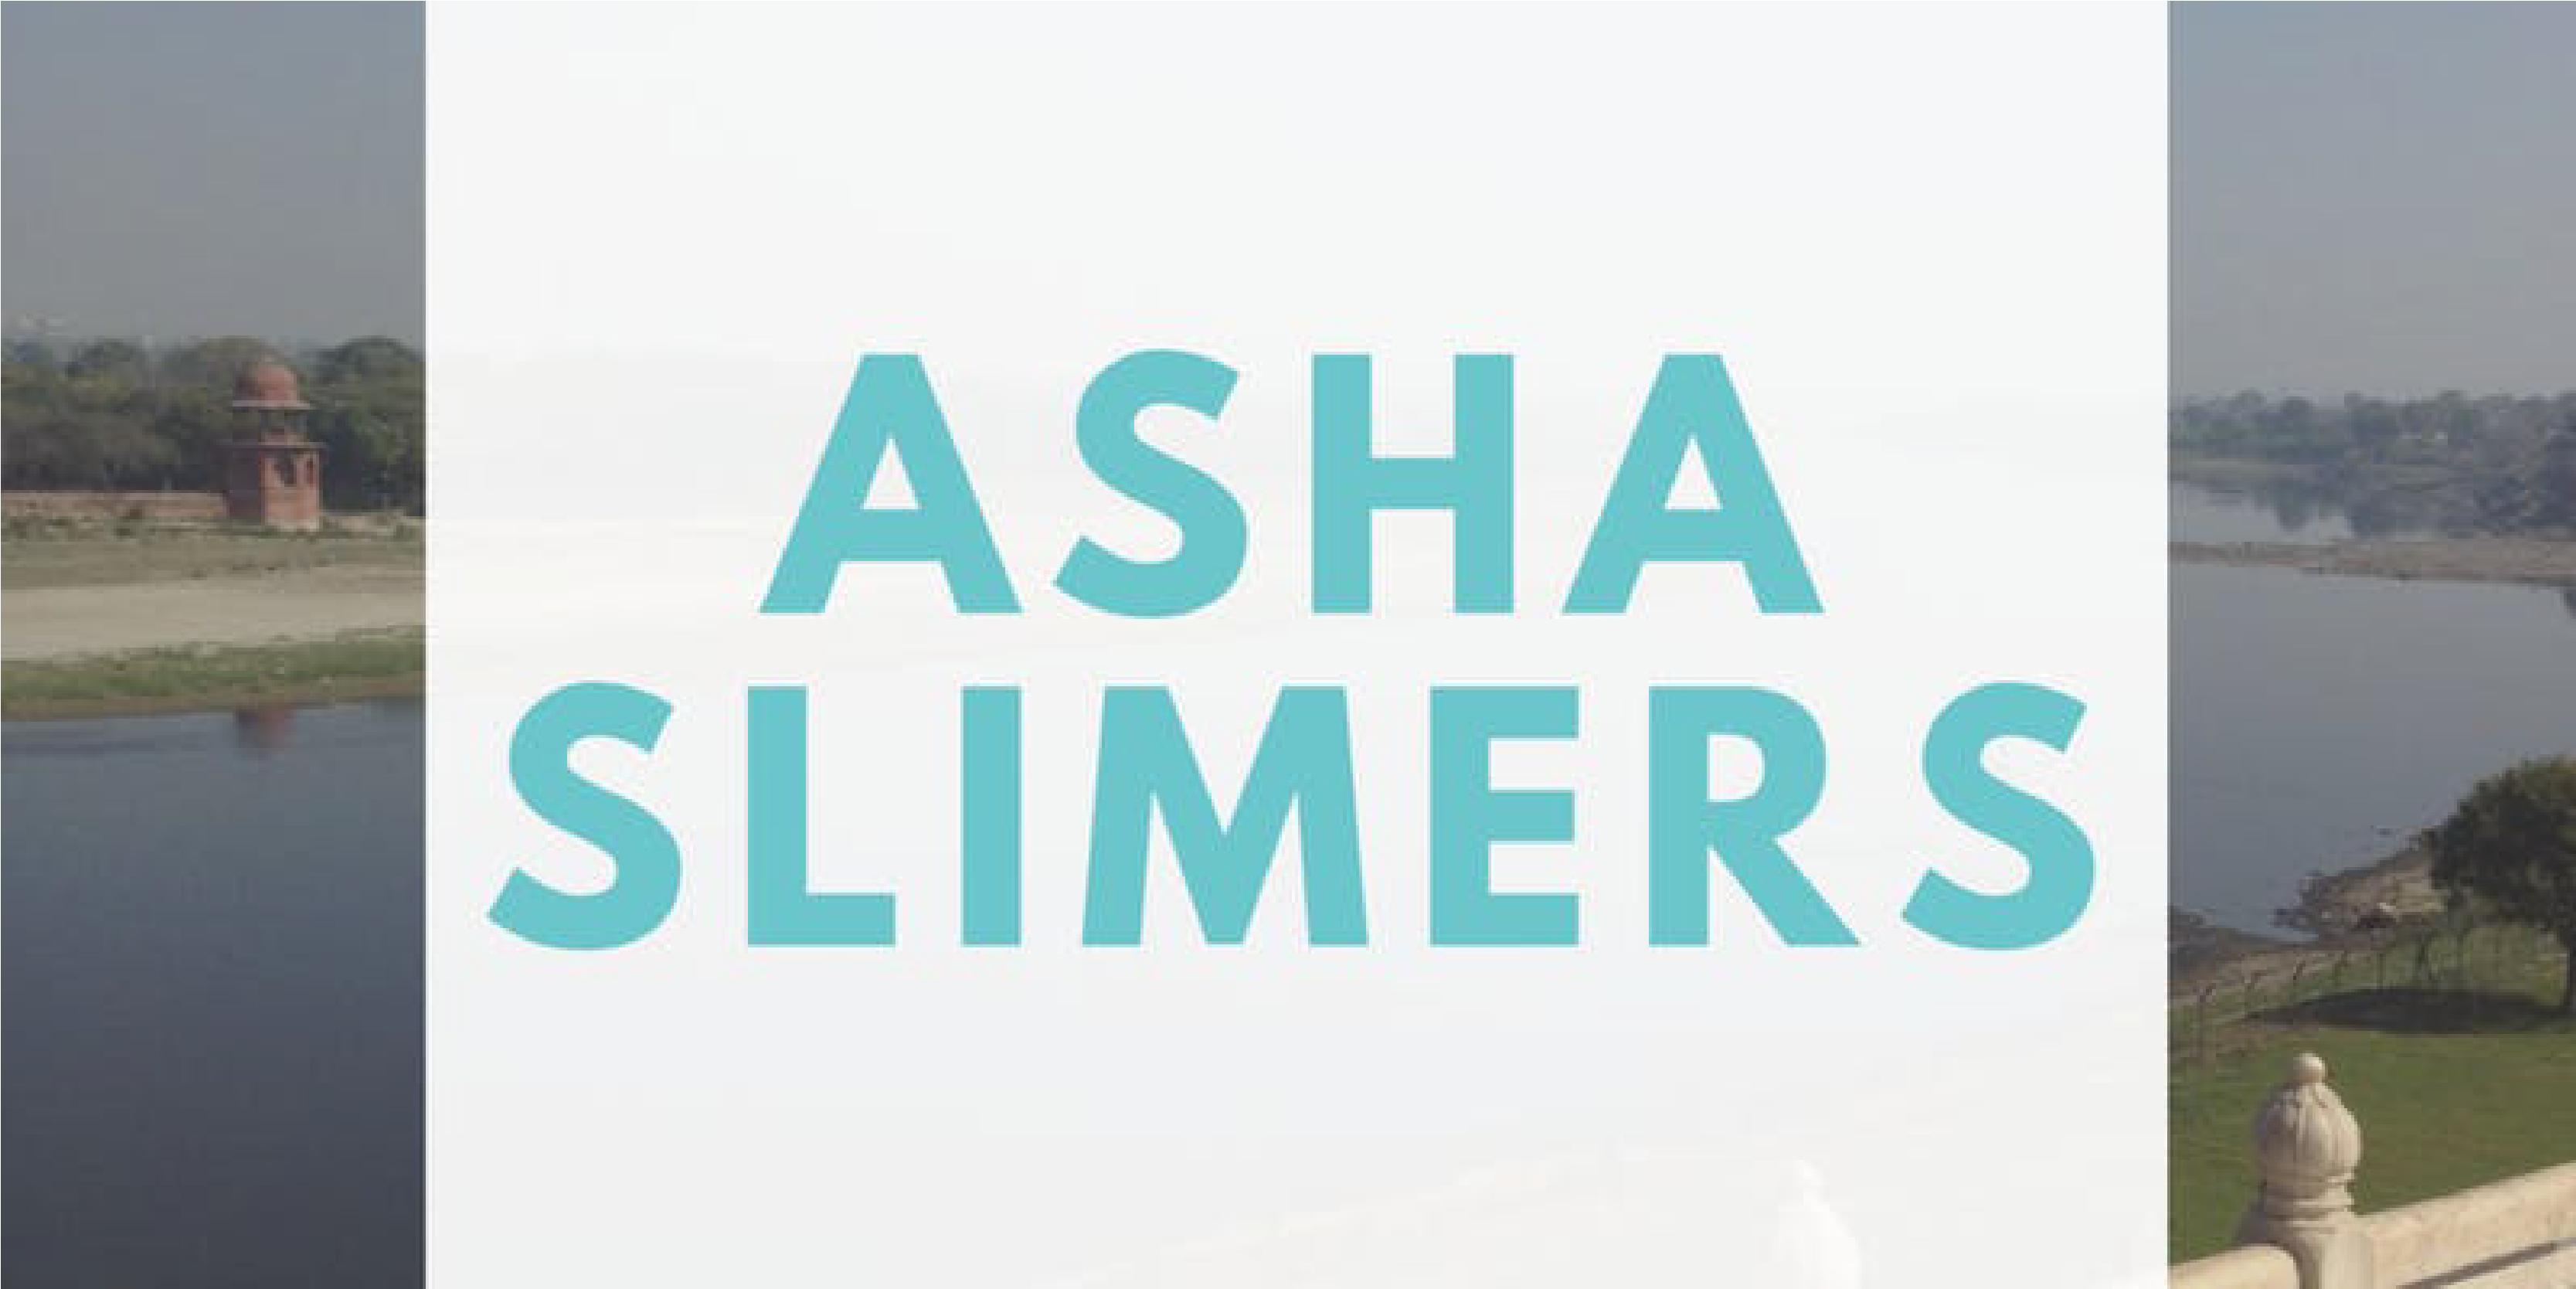 Asha Slimers